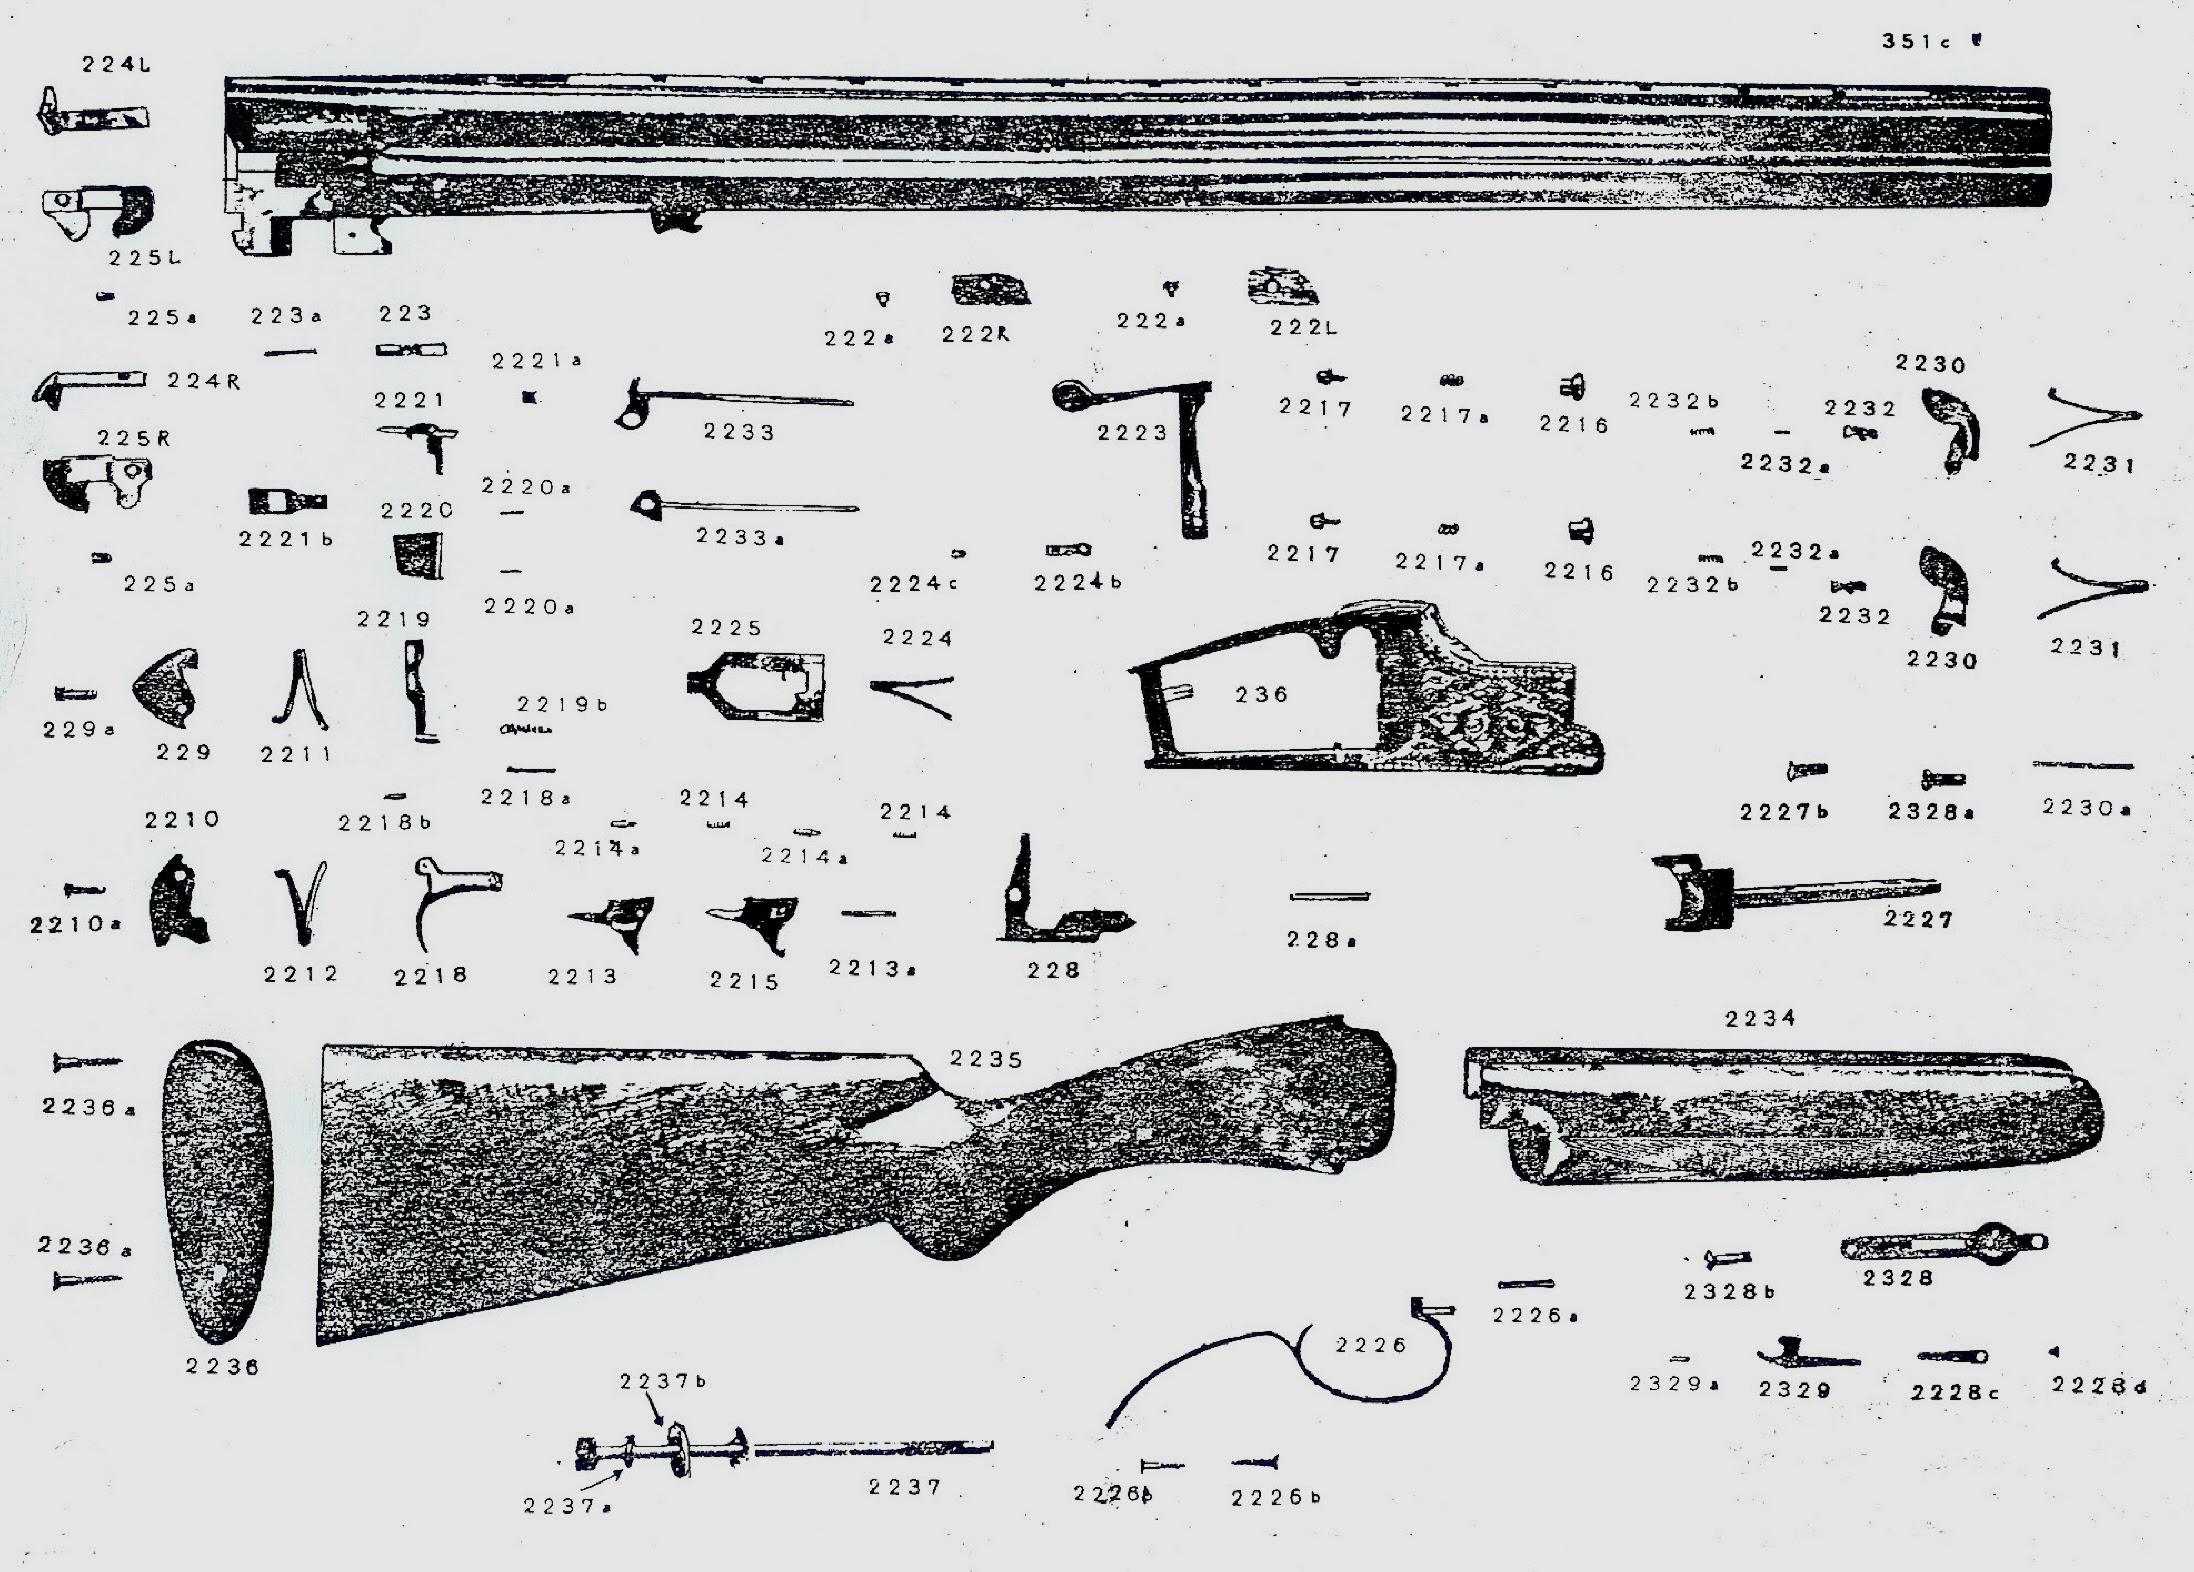 How The Rifle And Handgun Fire Wiring Diagram